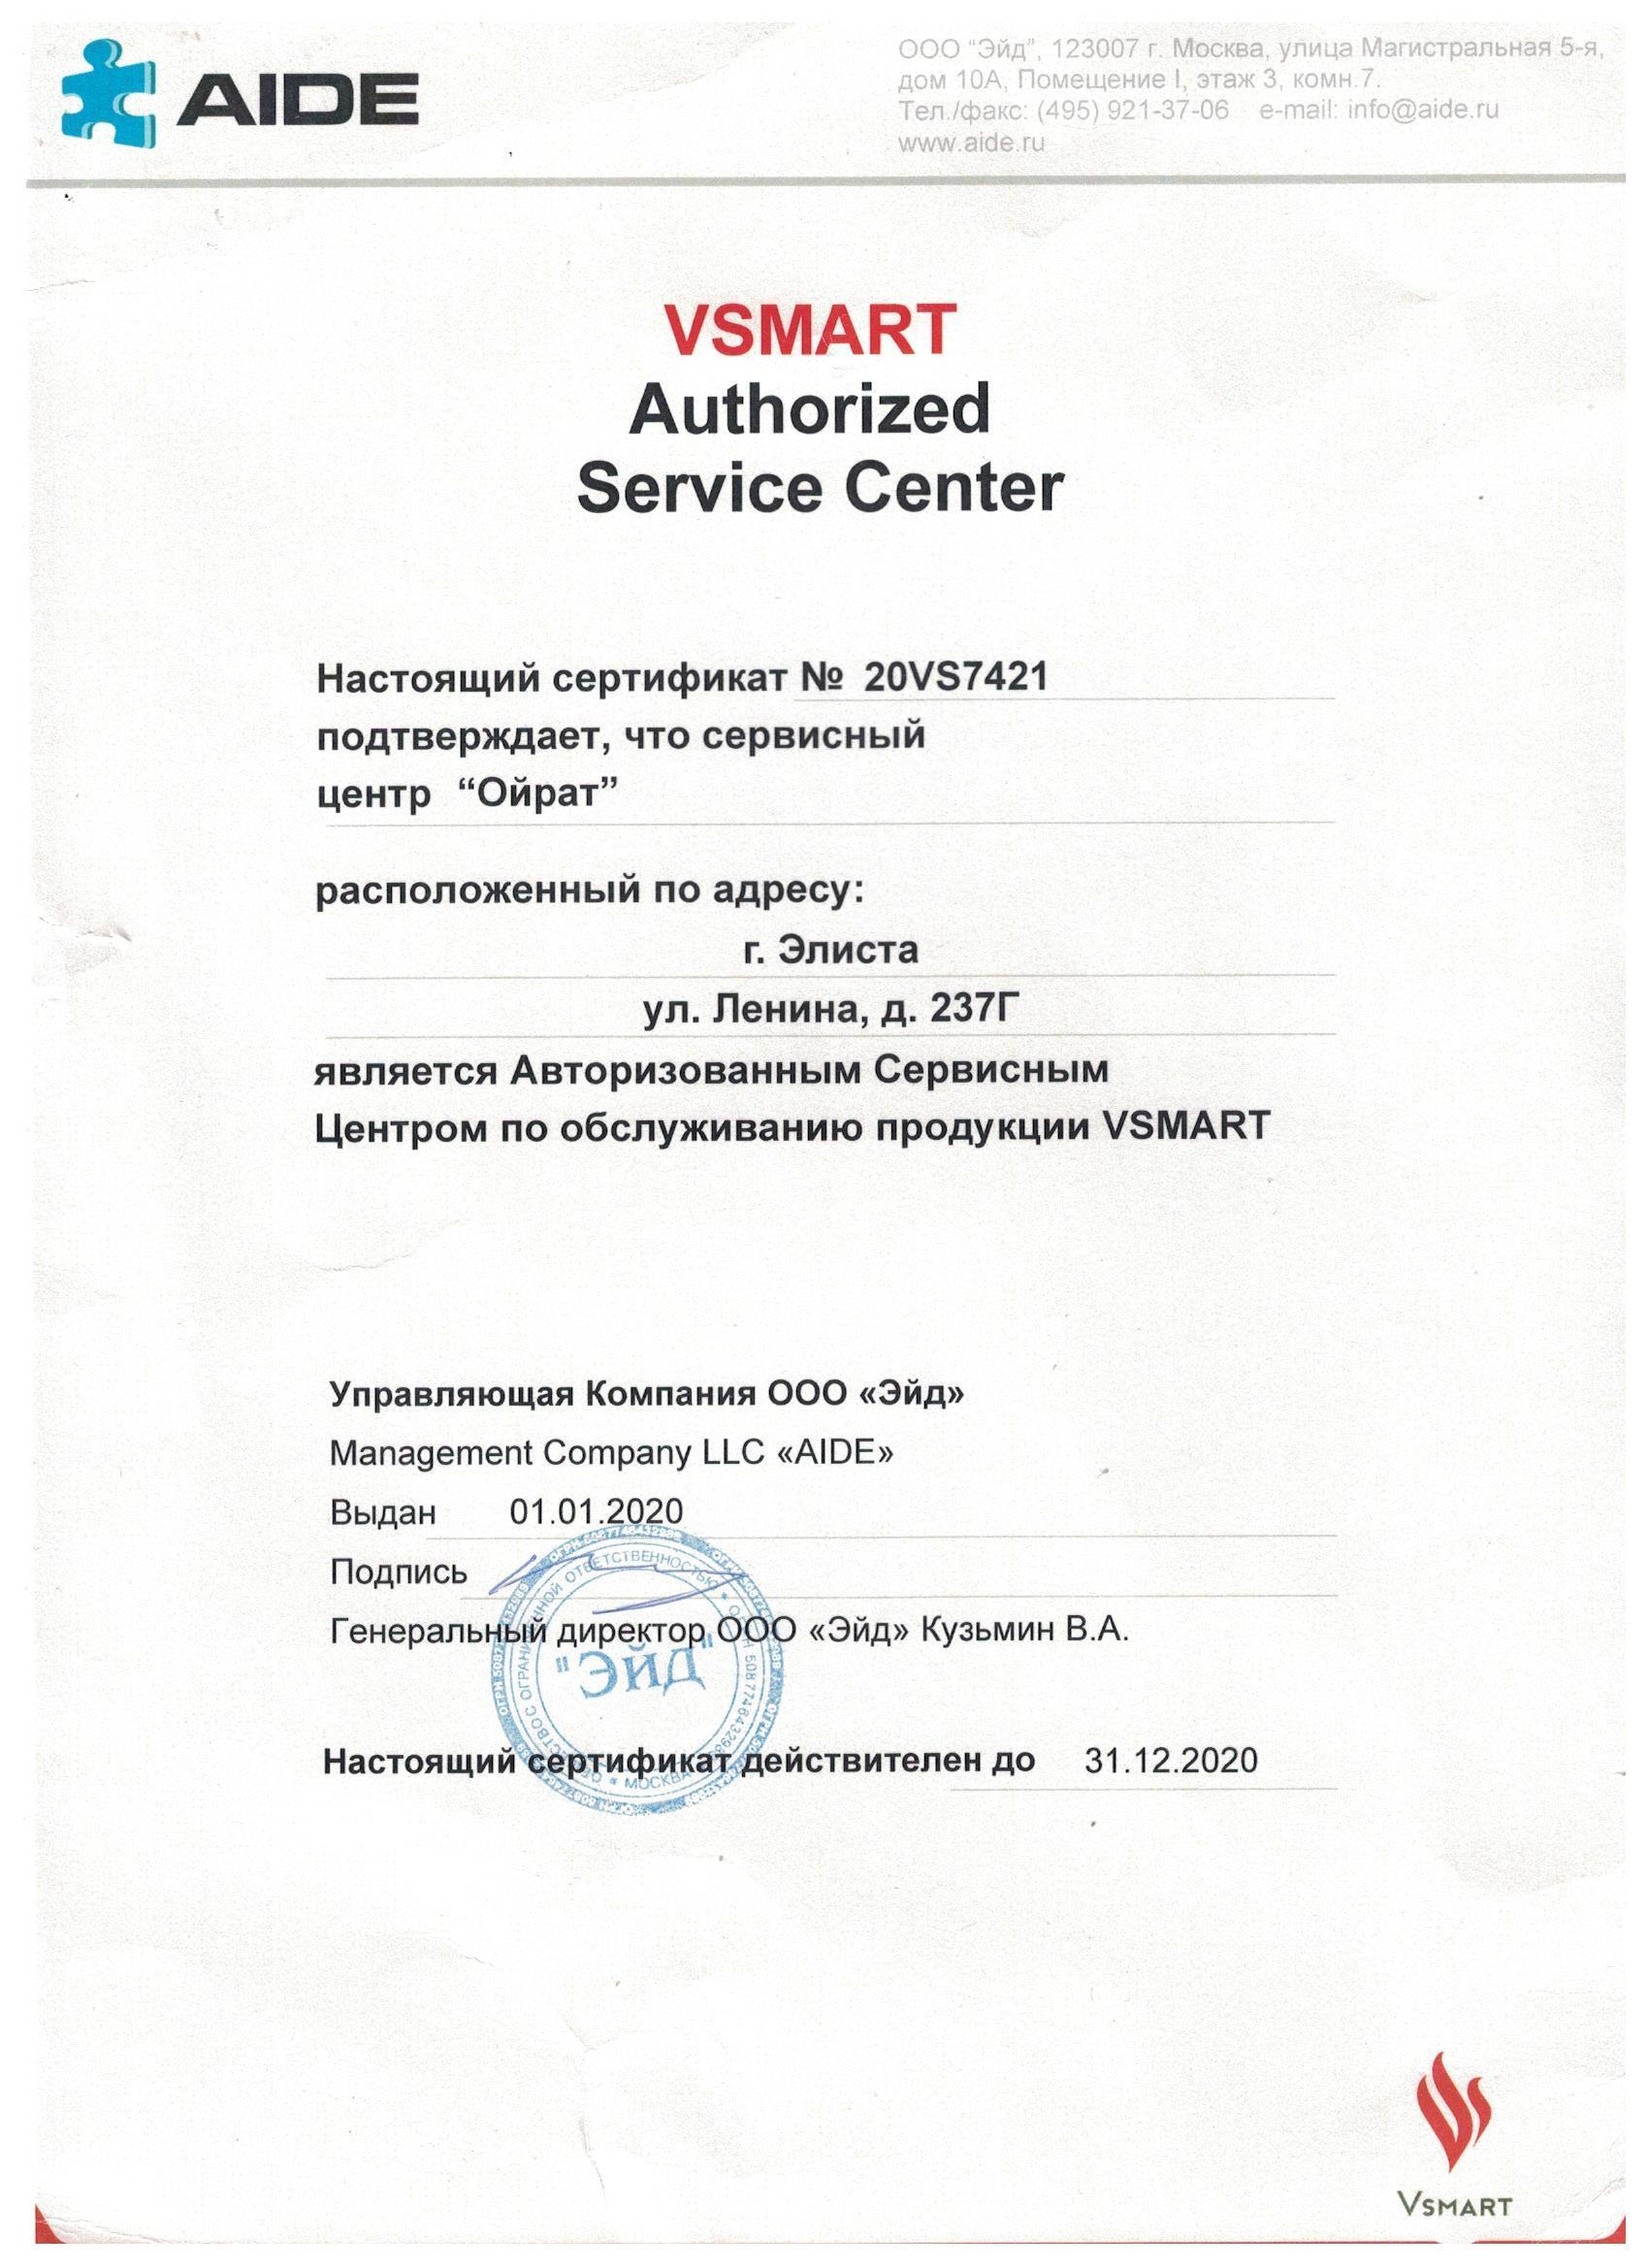 vSMART 001